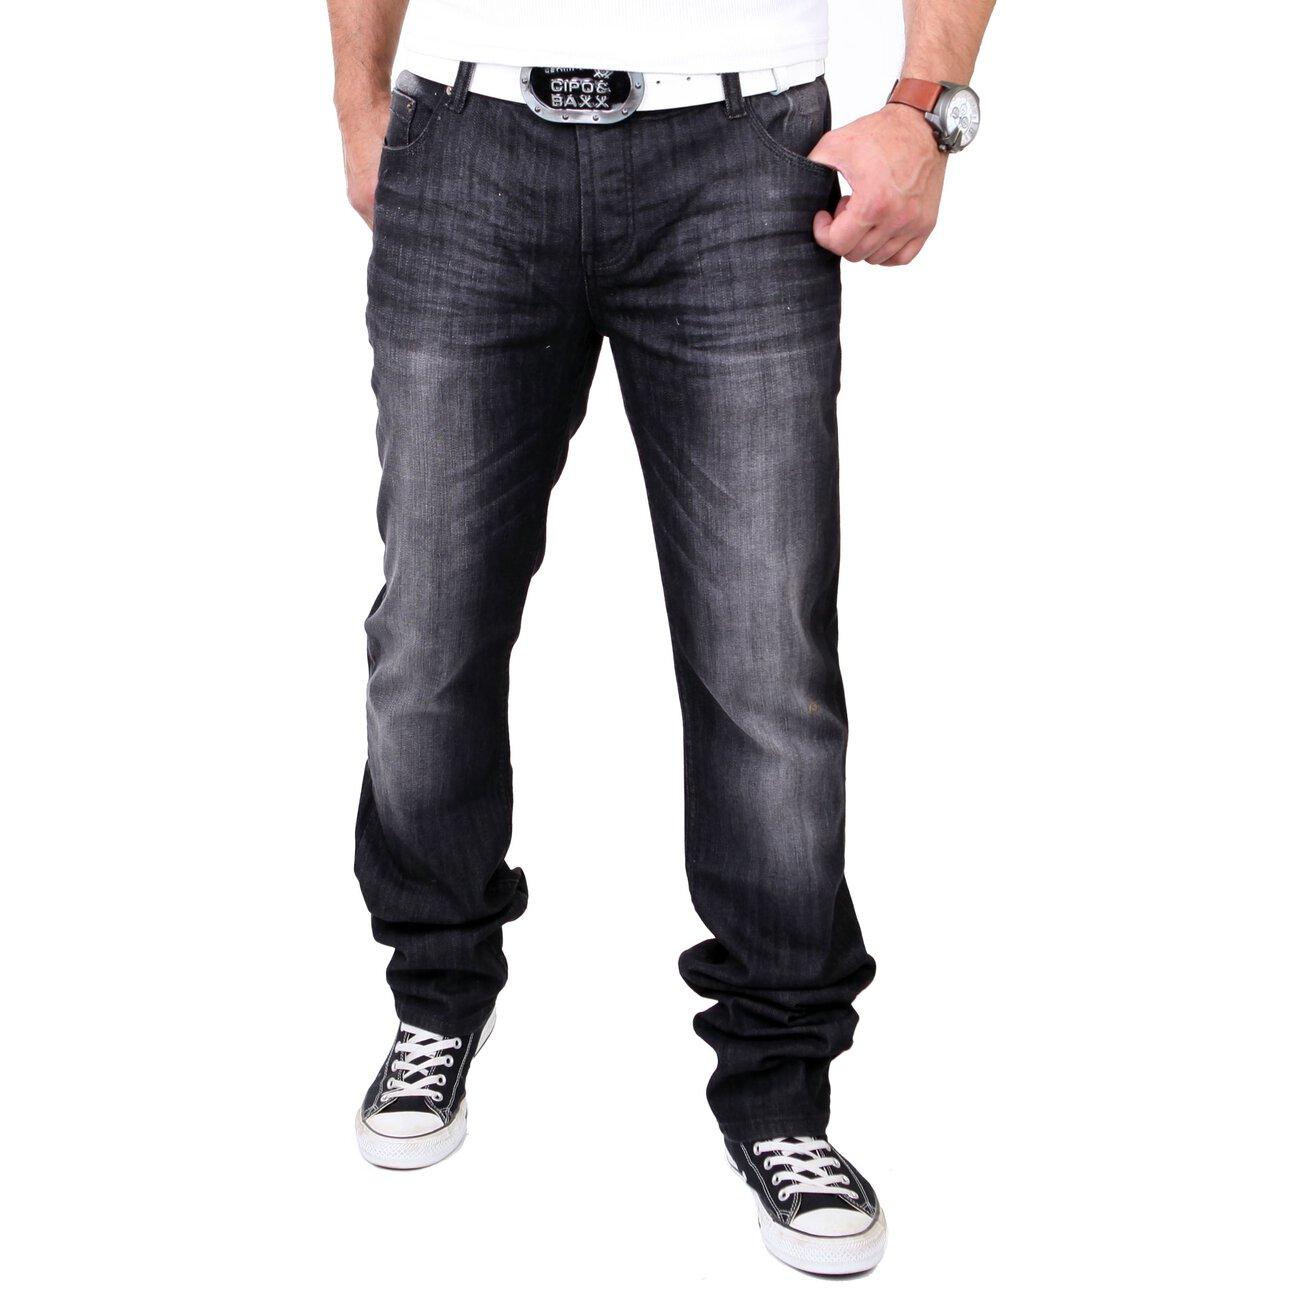 tazzio jeans herren used look jeanshose schwarz g nstig. Black Bedroom Furniture Sets. Home Design Ideas